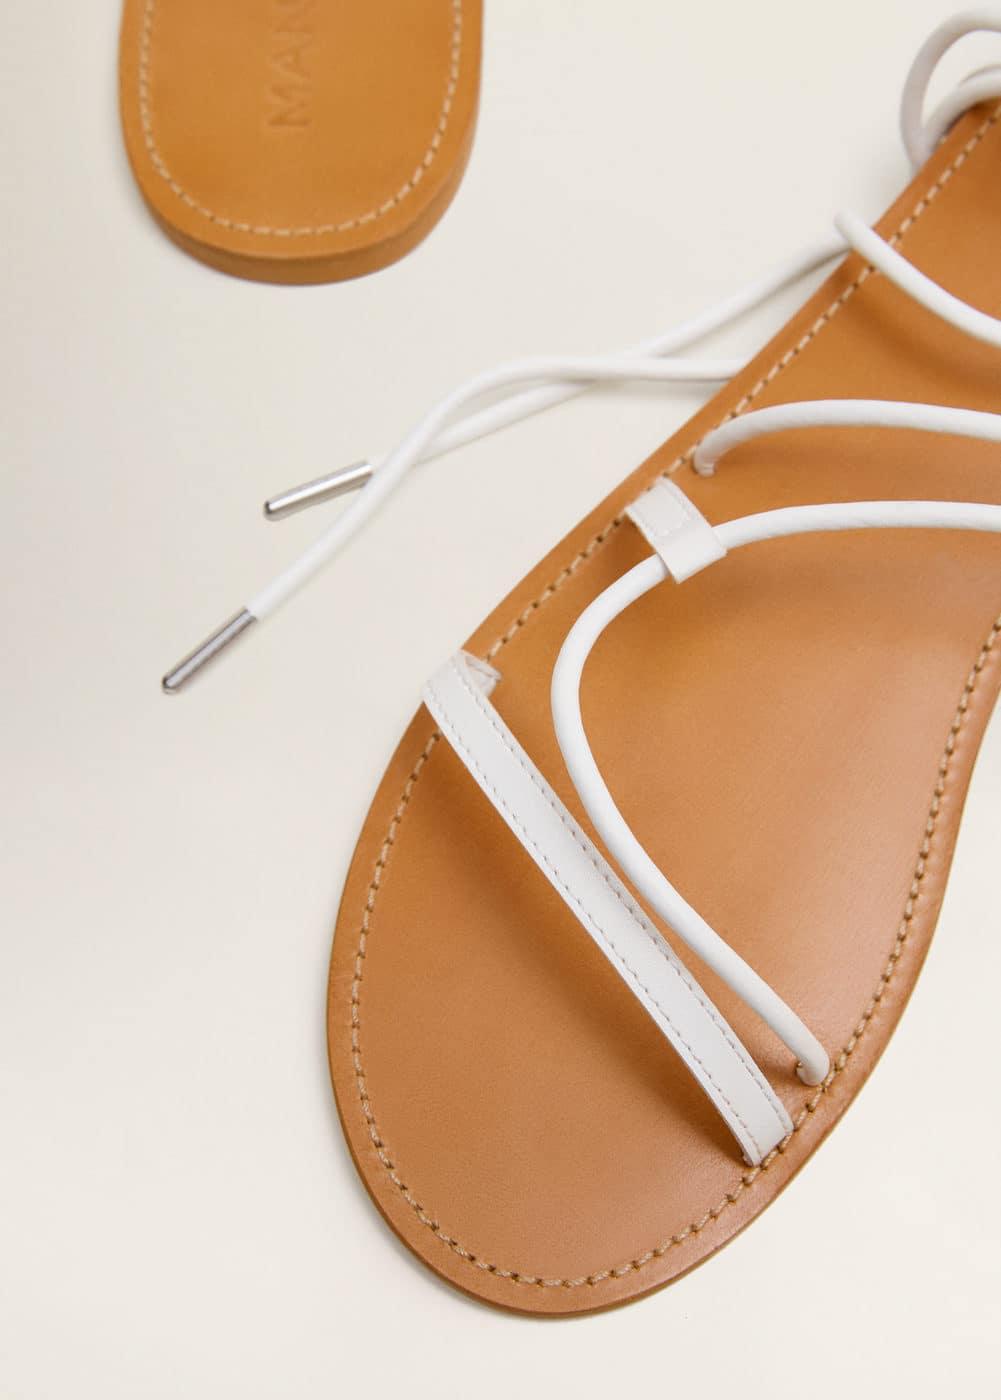 Criss cross straps sandals